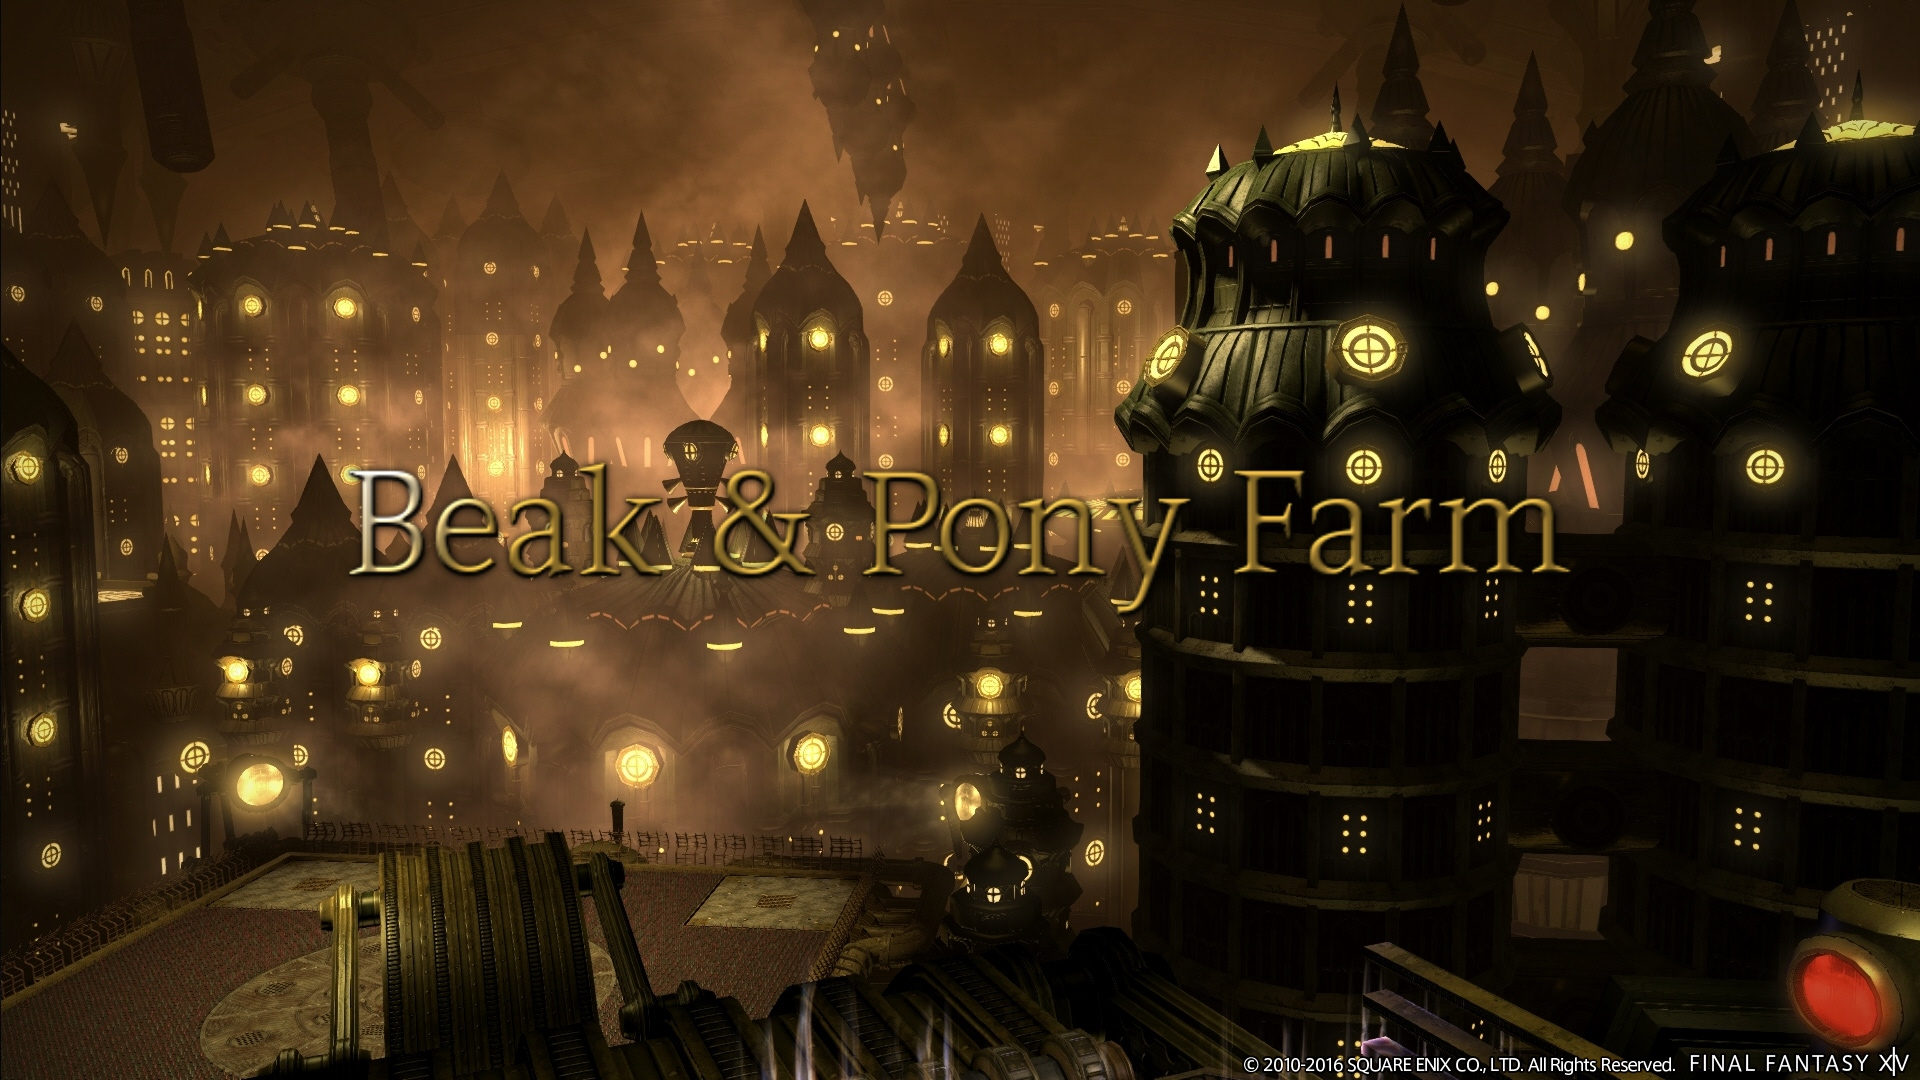 Beak & Pony Farm - Eorzean Dork Knights